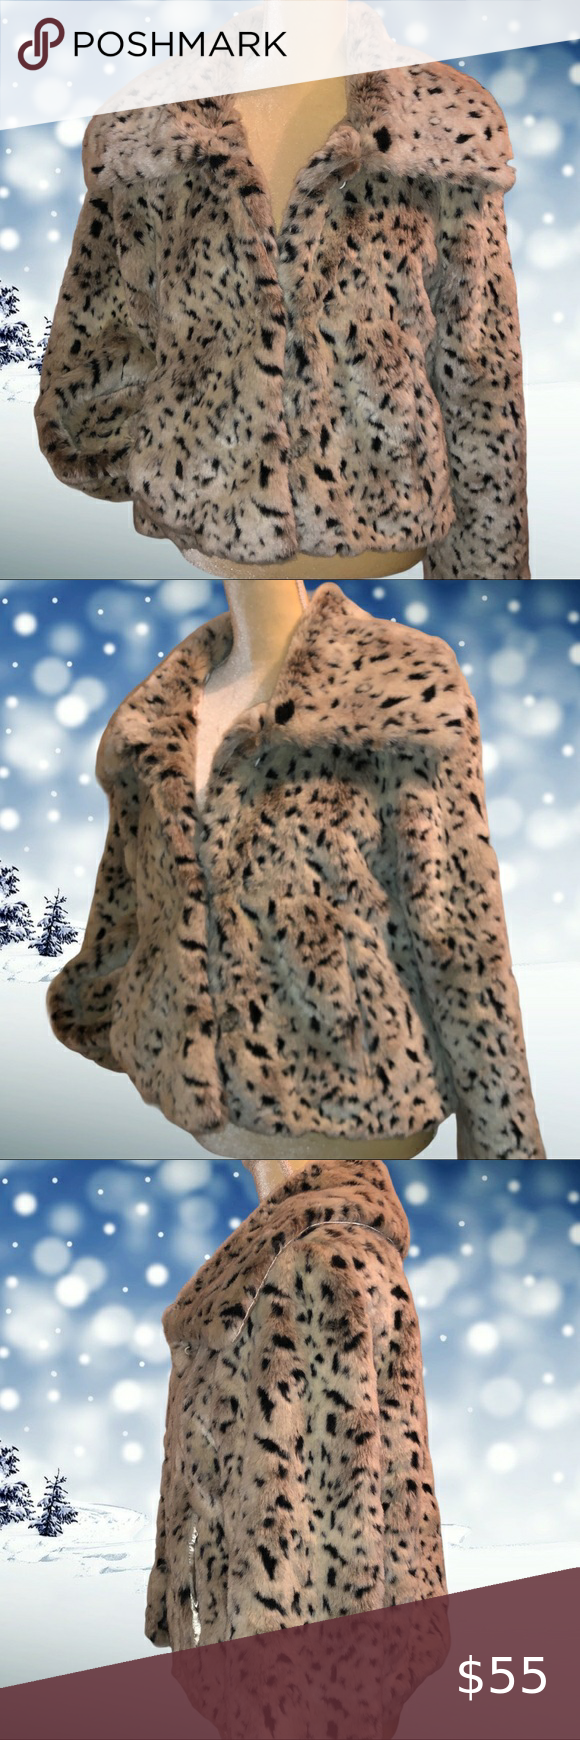 Covington Outerwear Jacket Animal Print Faux Fur Jacket Has Pockets In Front Really Cute Covi Outerwear Jackets Blazer Jackets For Women Coats Jackets Women [ 1740 x 580 Pixel ]